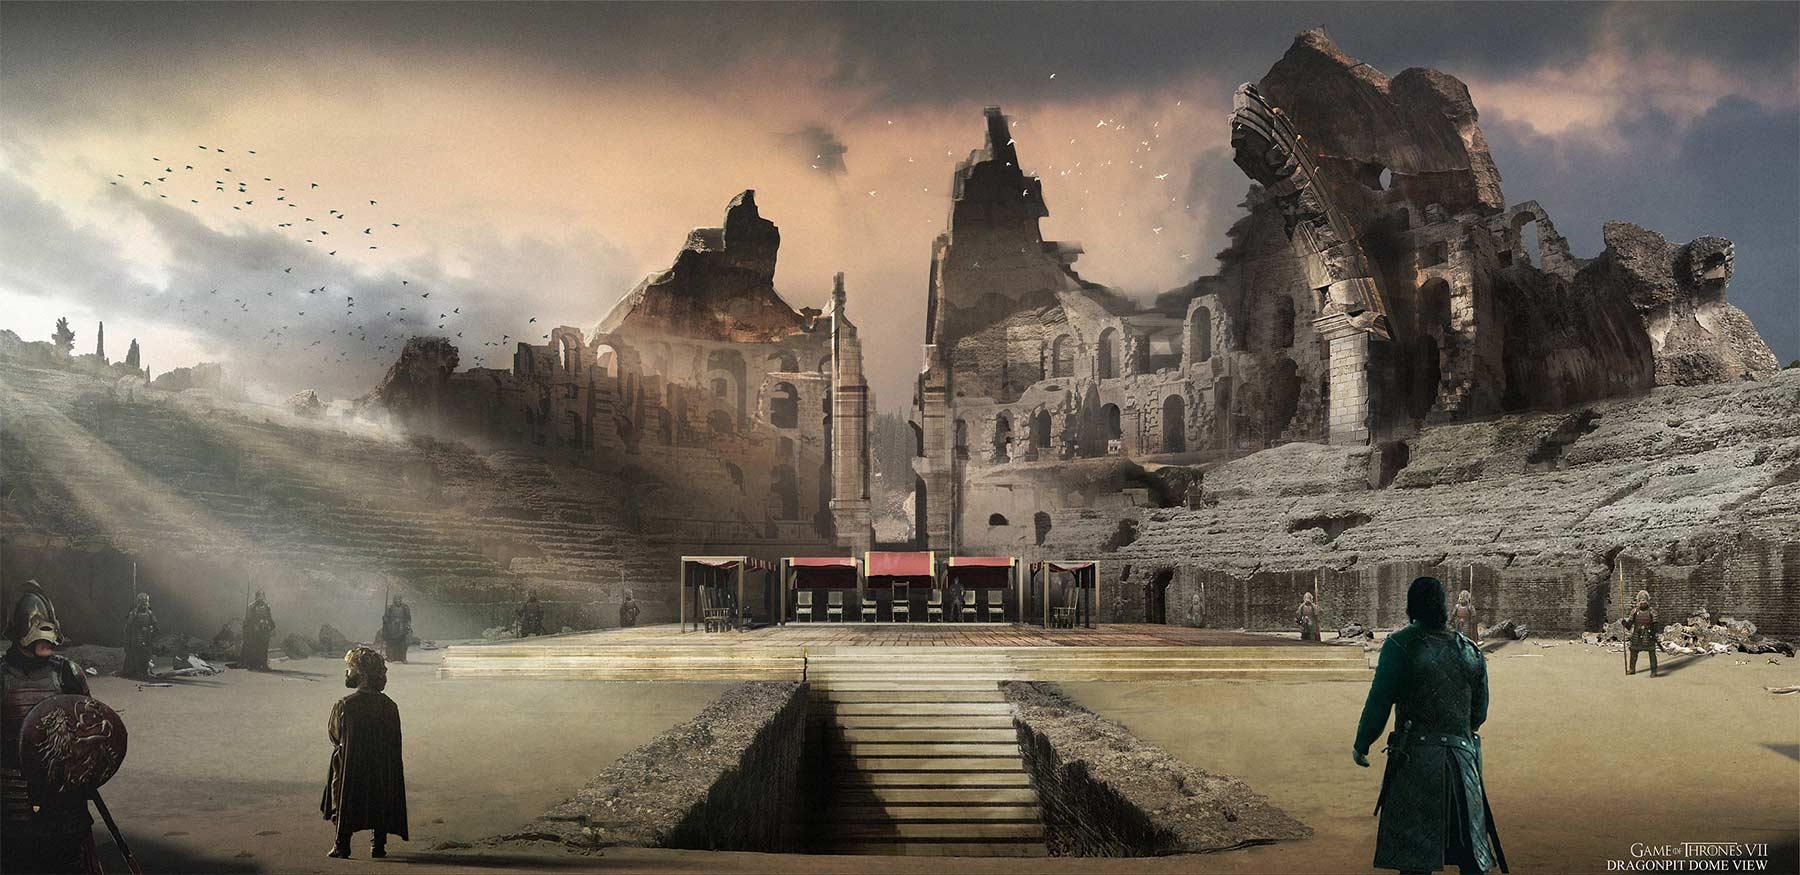 Game of Thrones Staffel 7 Concept Art Kieran-Belshaw-game-of-thrones-concept-art_09